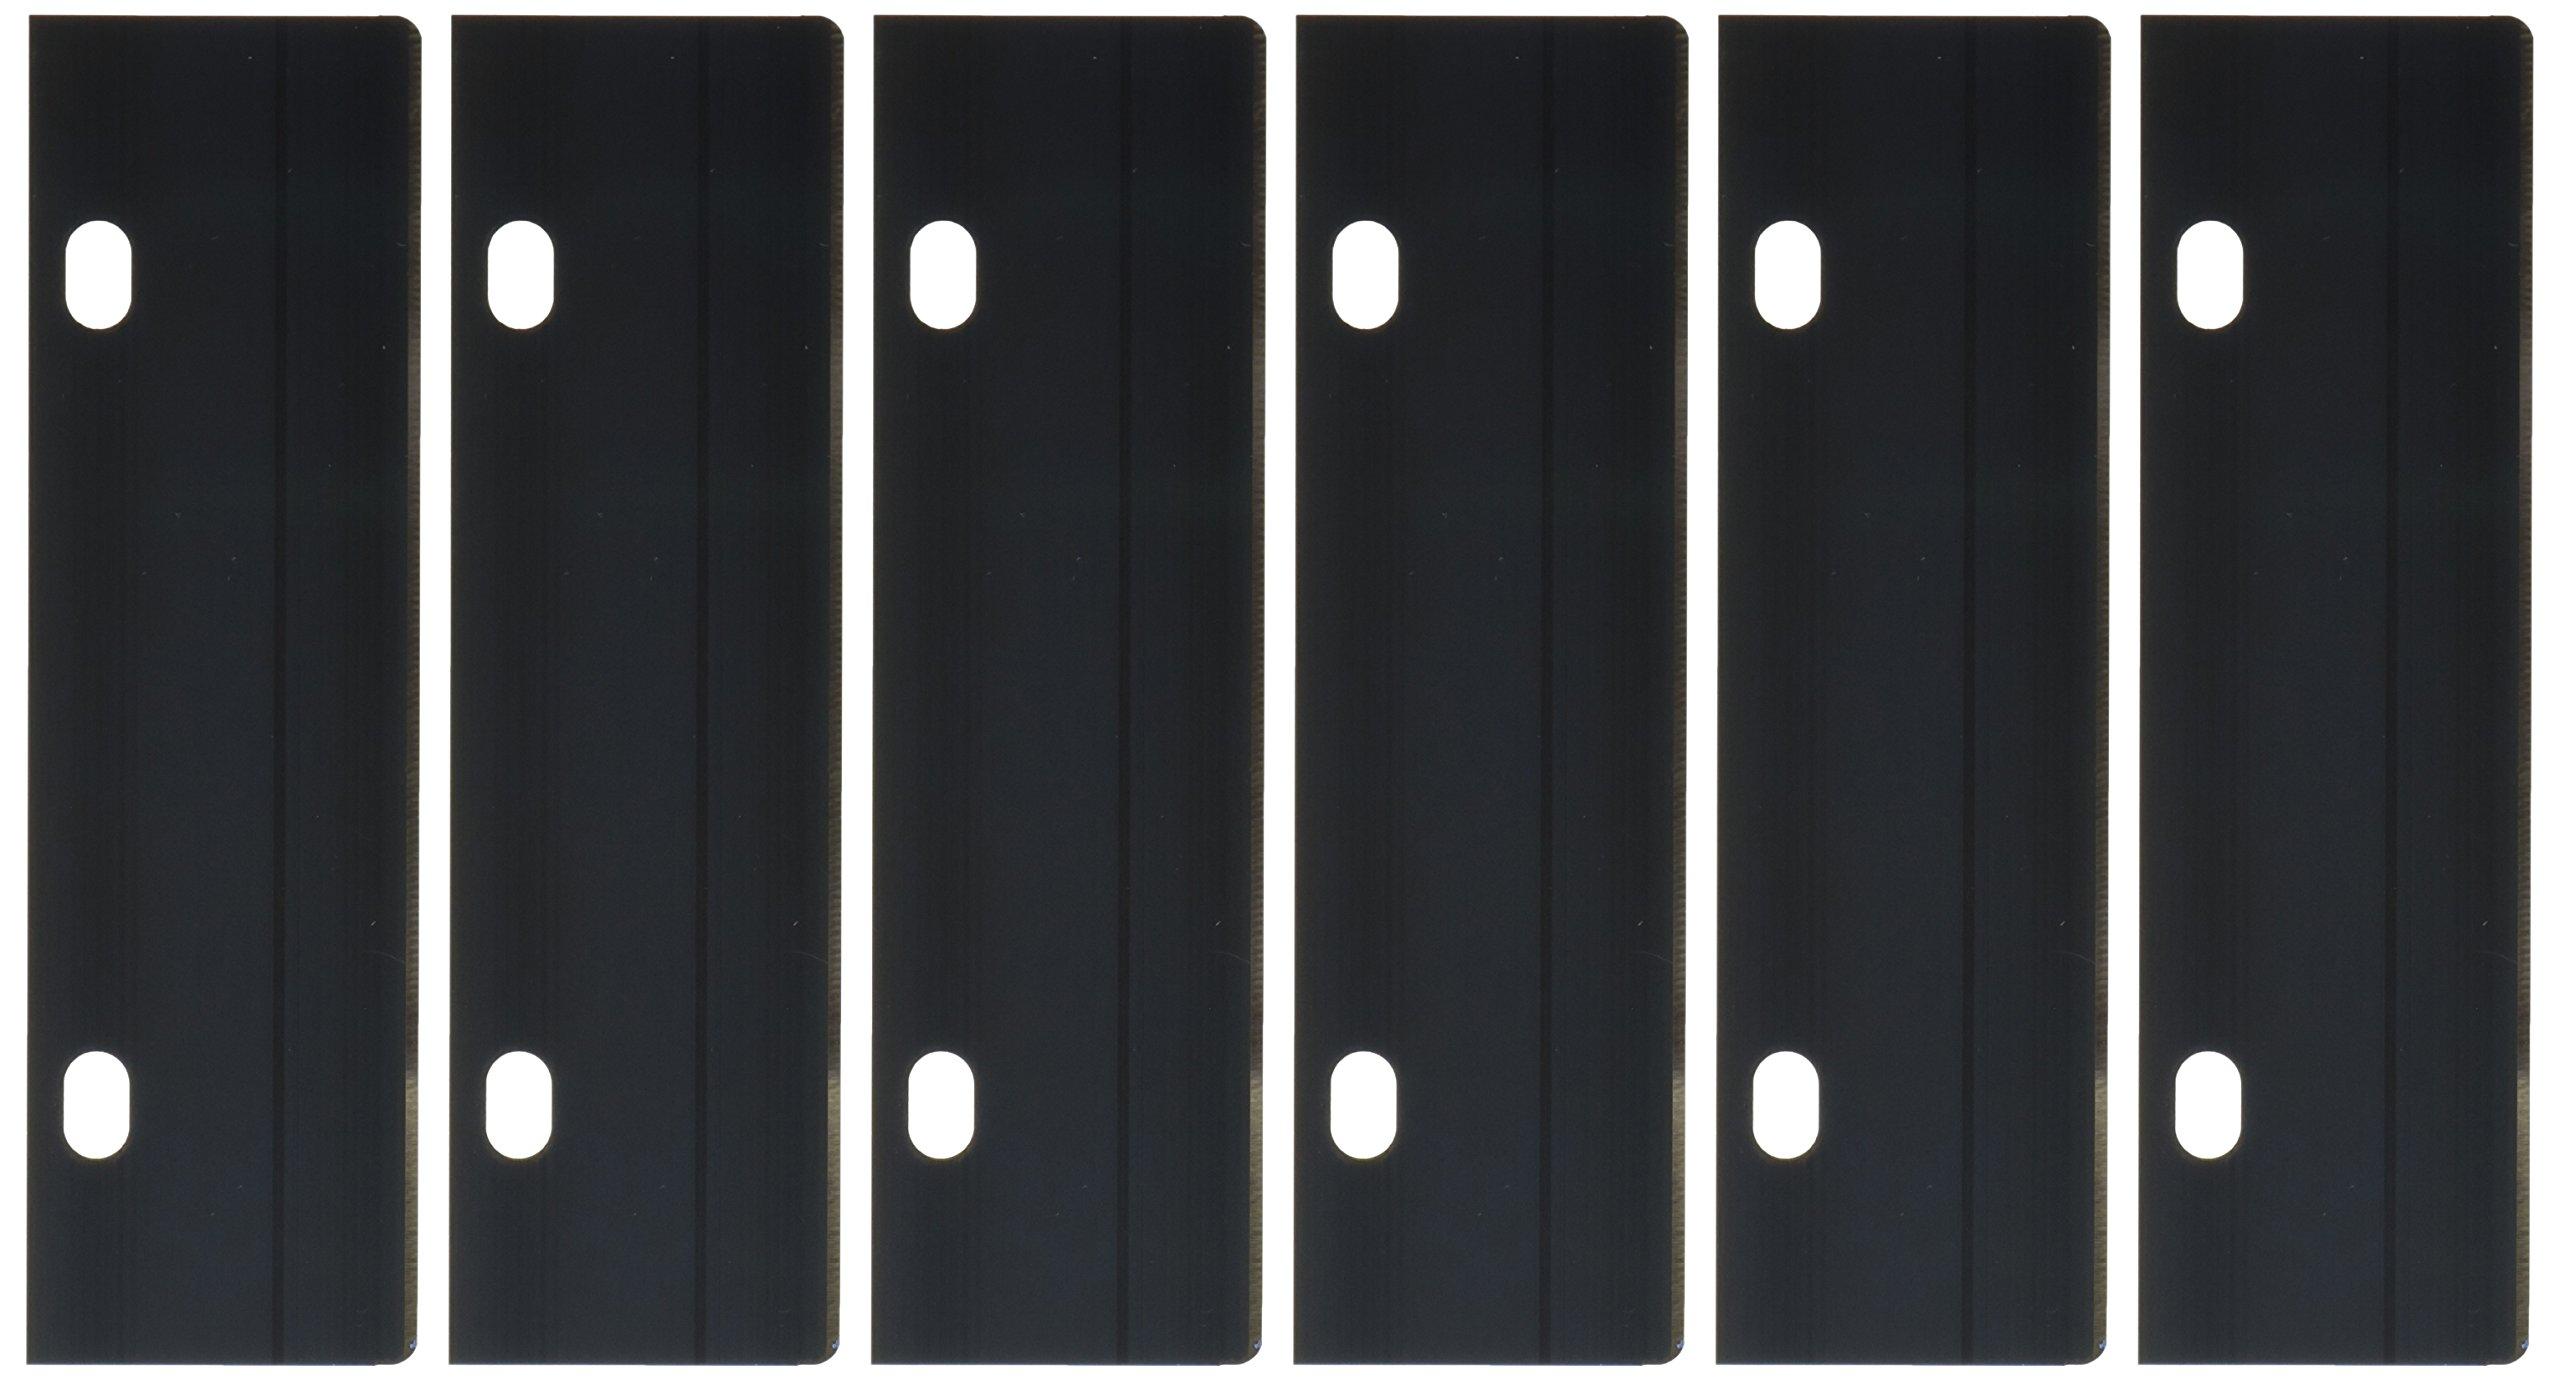 Nemco (55607-6) Easy Grill Scraper Replacement Blade [Case of 6]